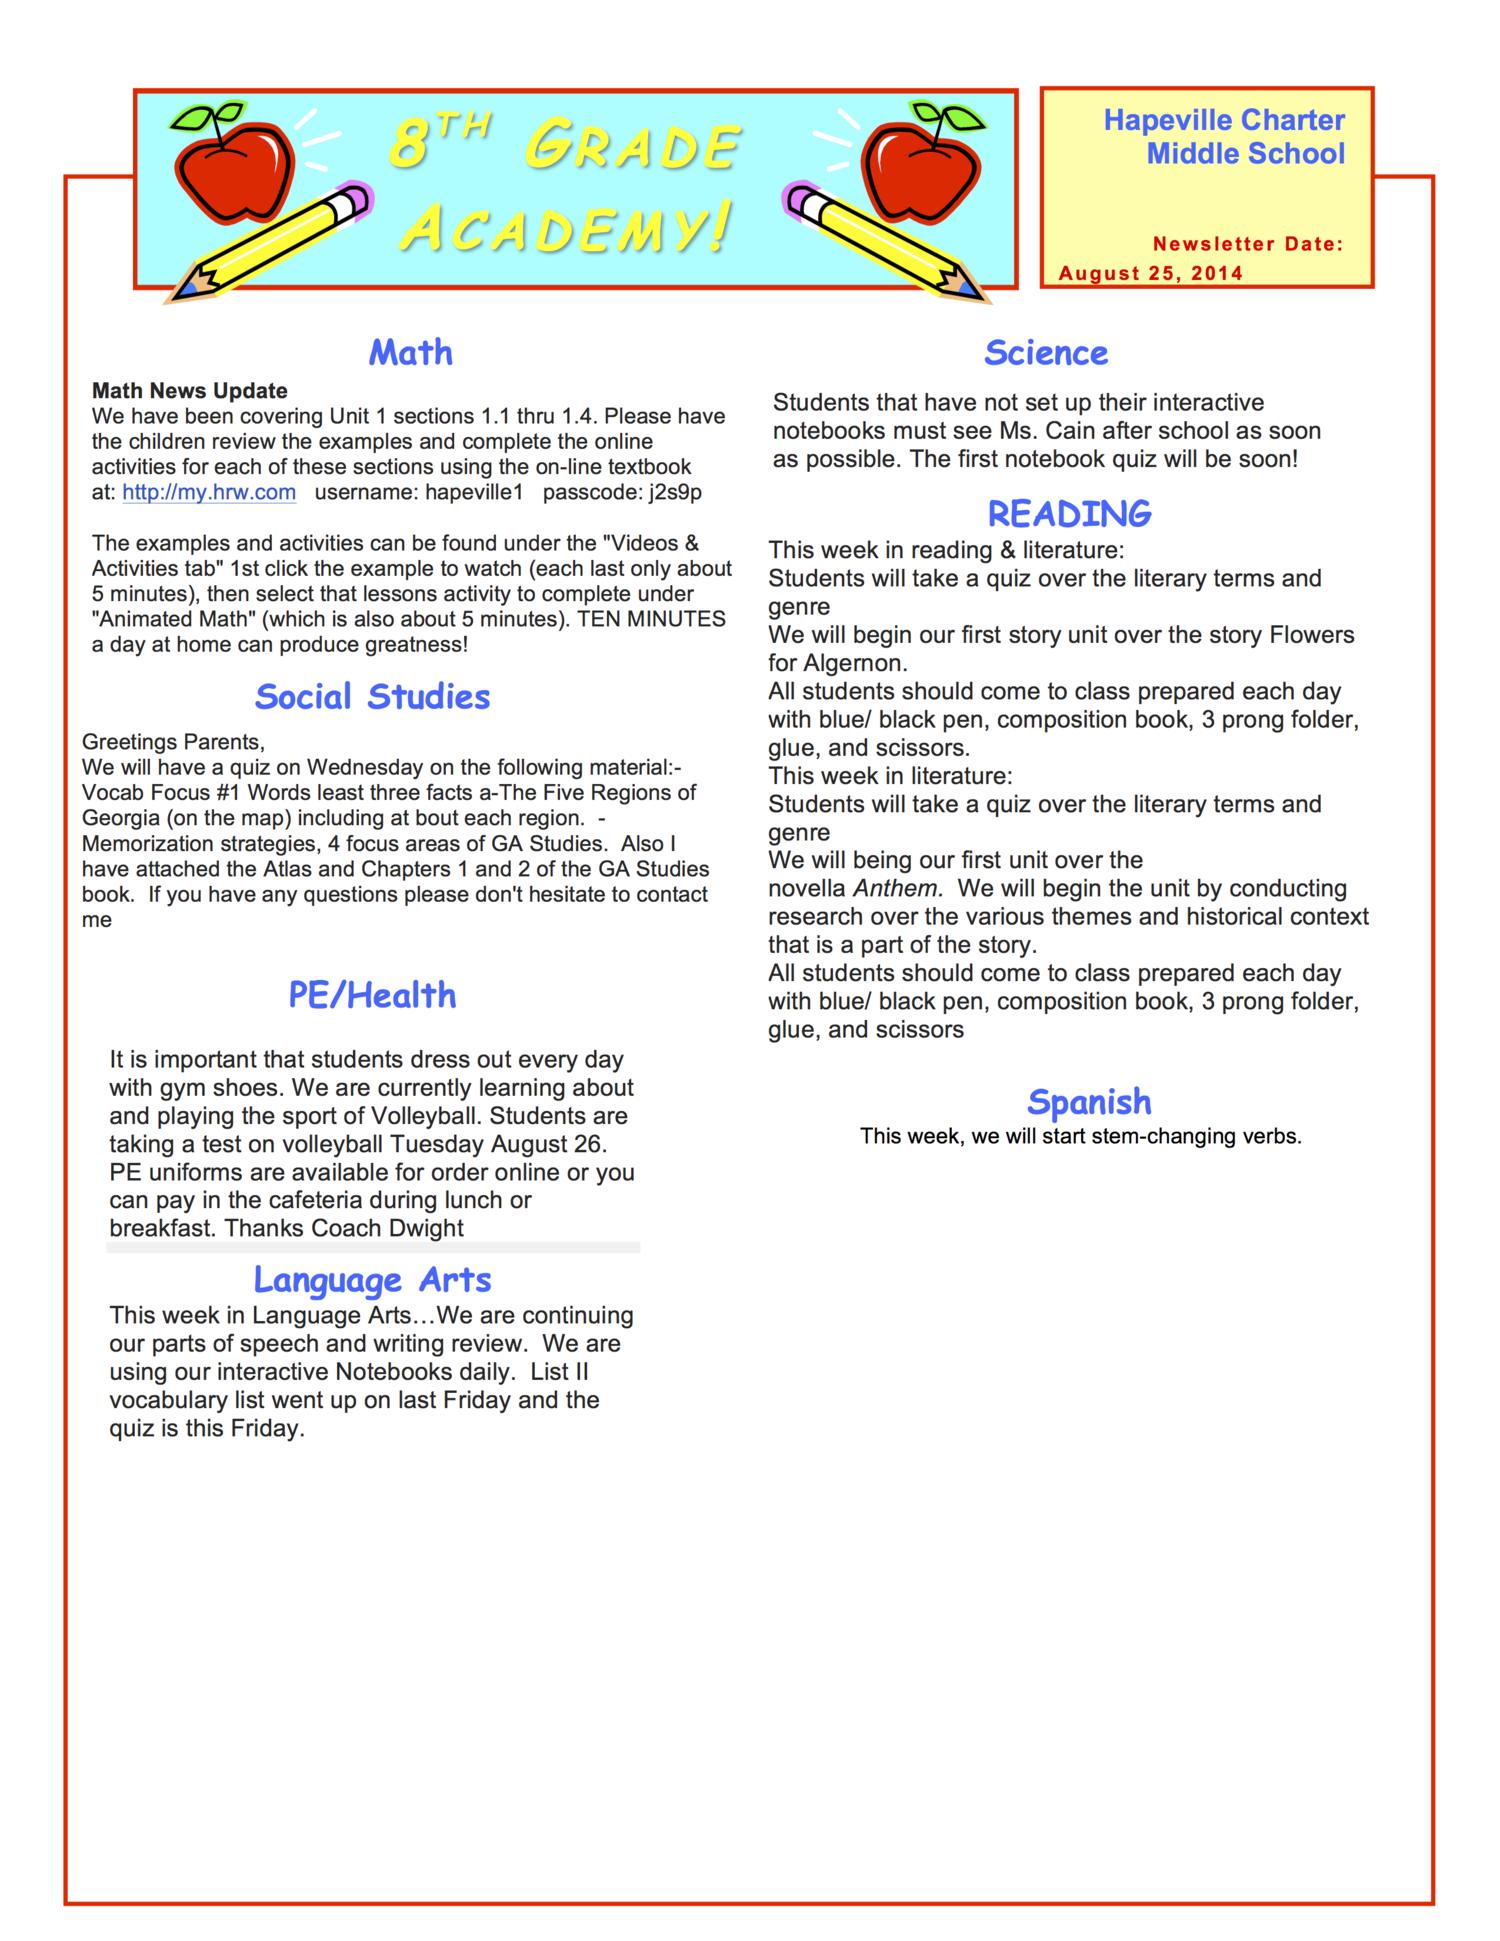 Week Of August 25 29 2014 Hapeville Charter Middle School